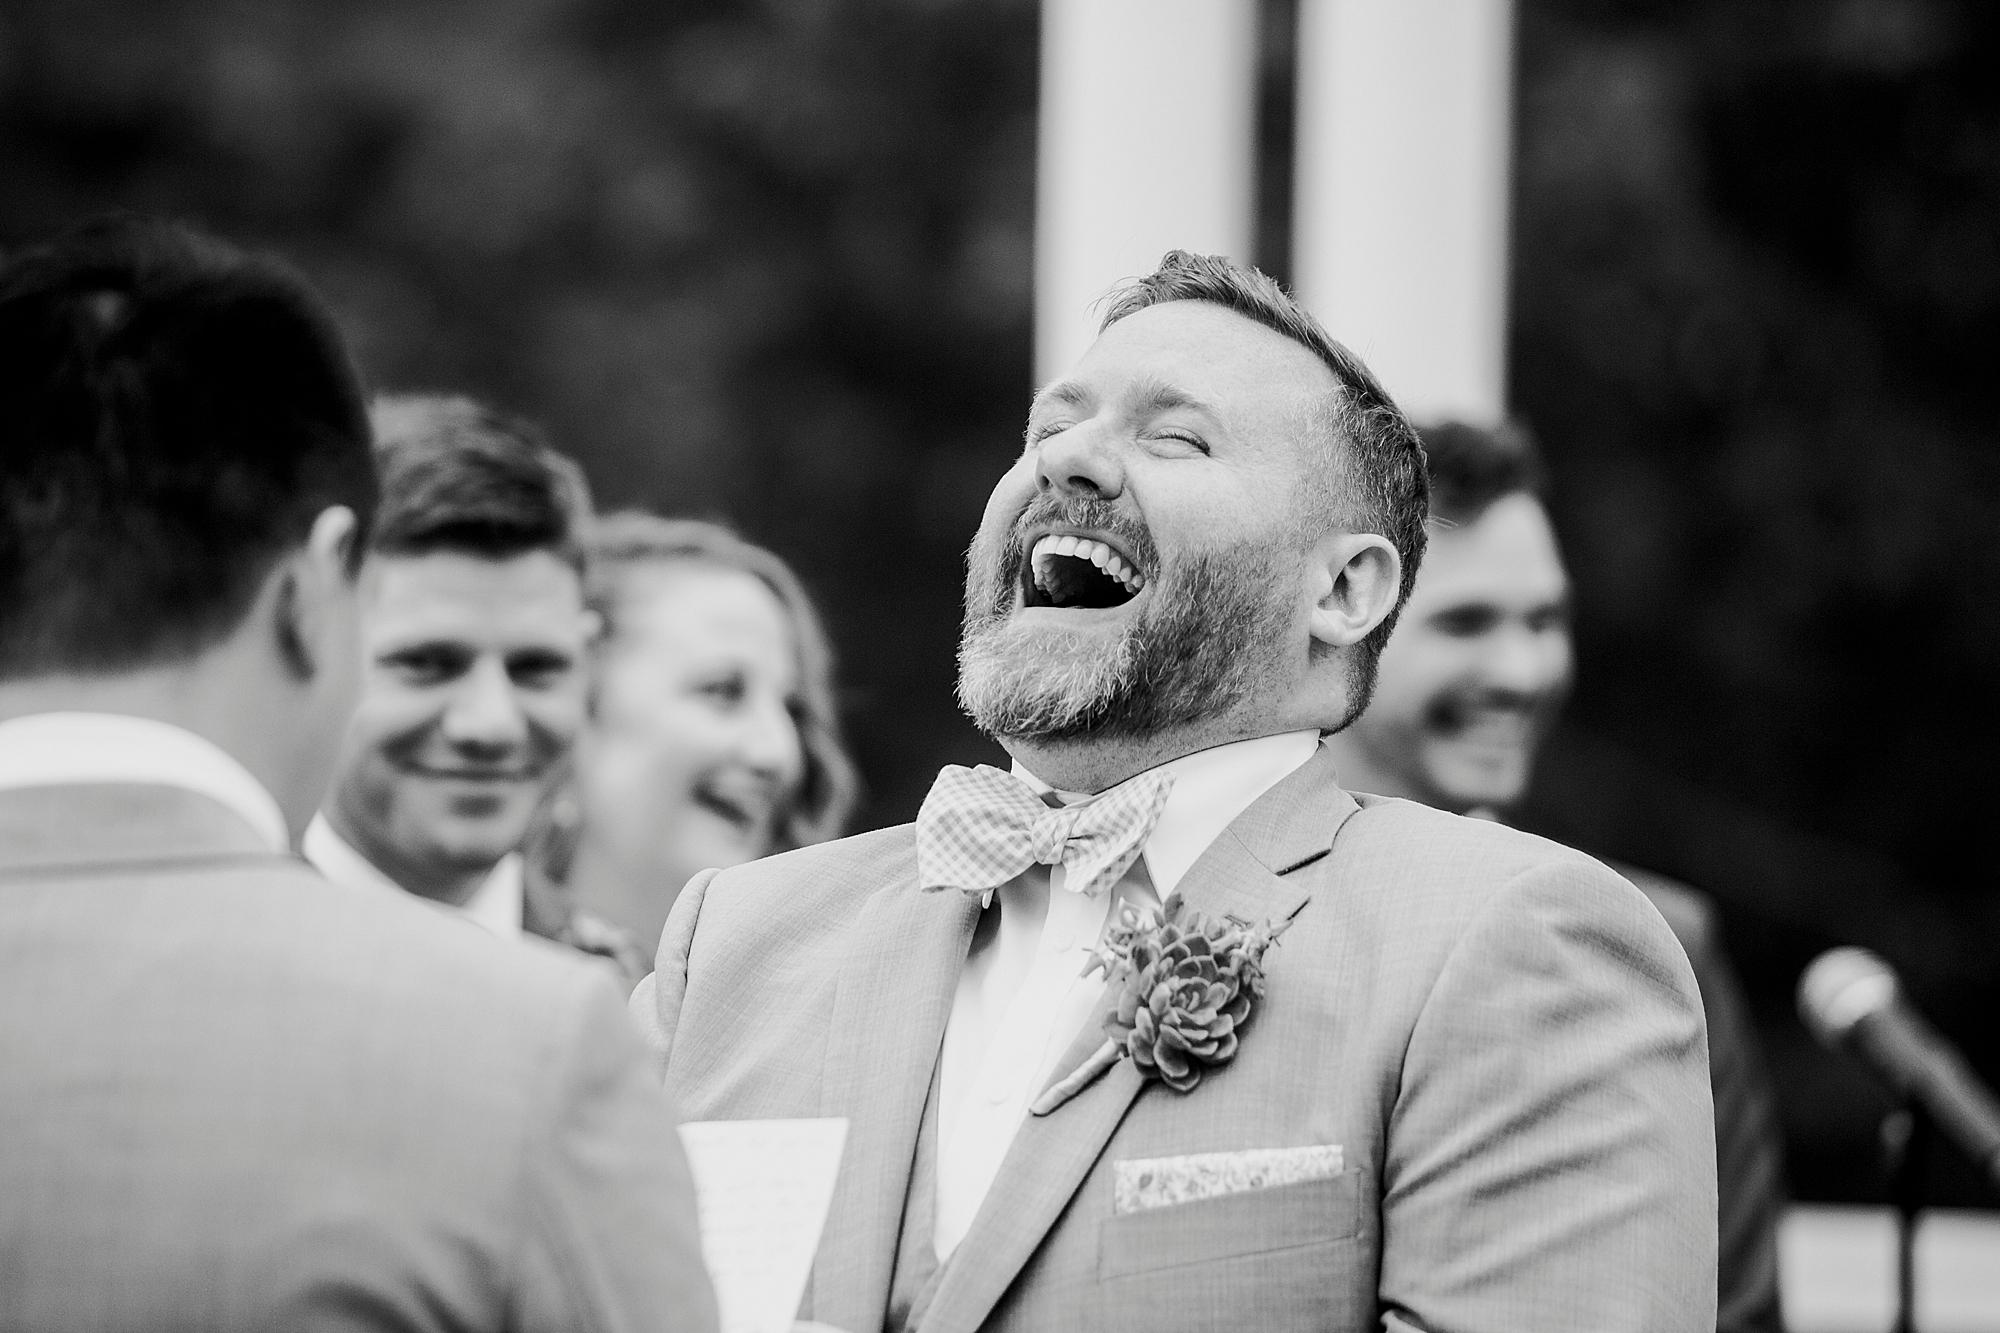 Dan_and_Byron_Love_by_Joe_Mac_Philadelphia_Wedding_LGBTQ_Photography_Gay_Independence_visitor_Center_99.JPG